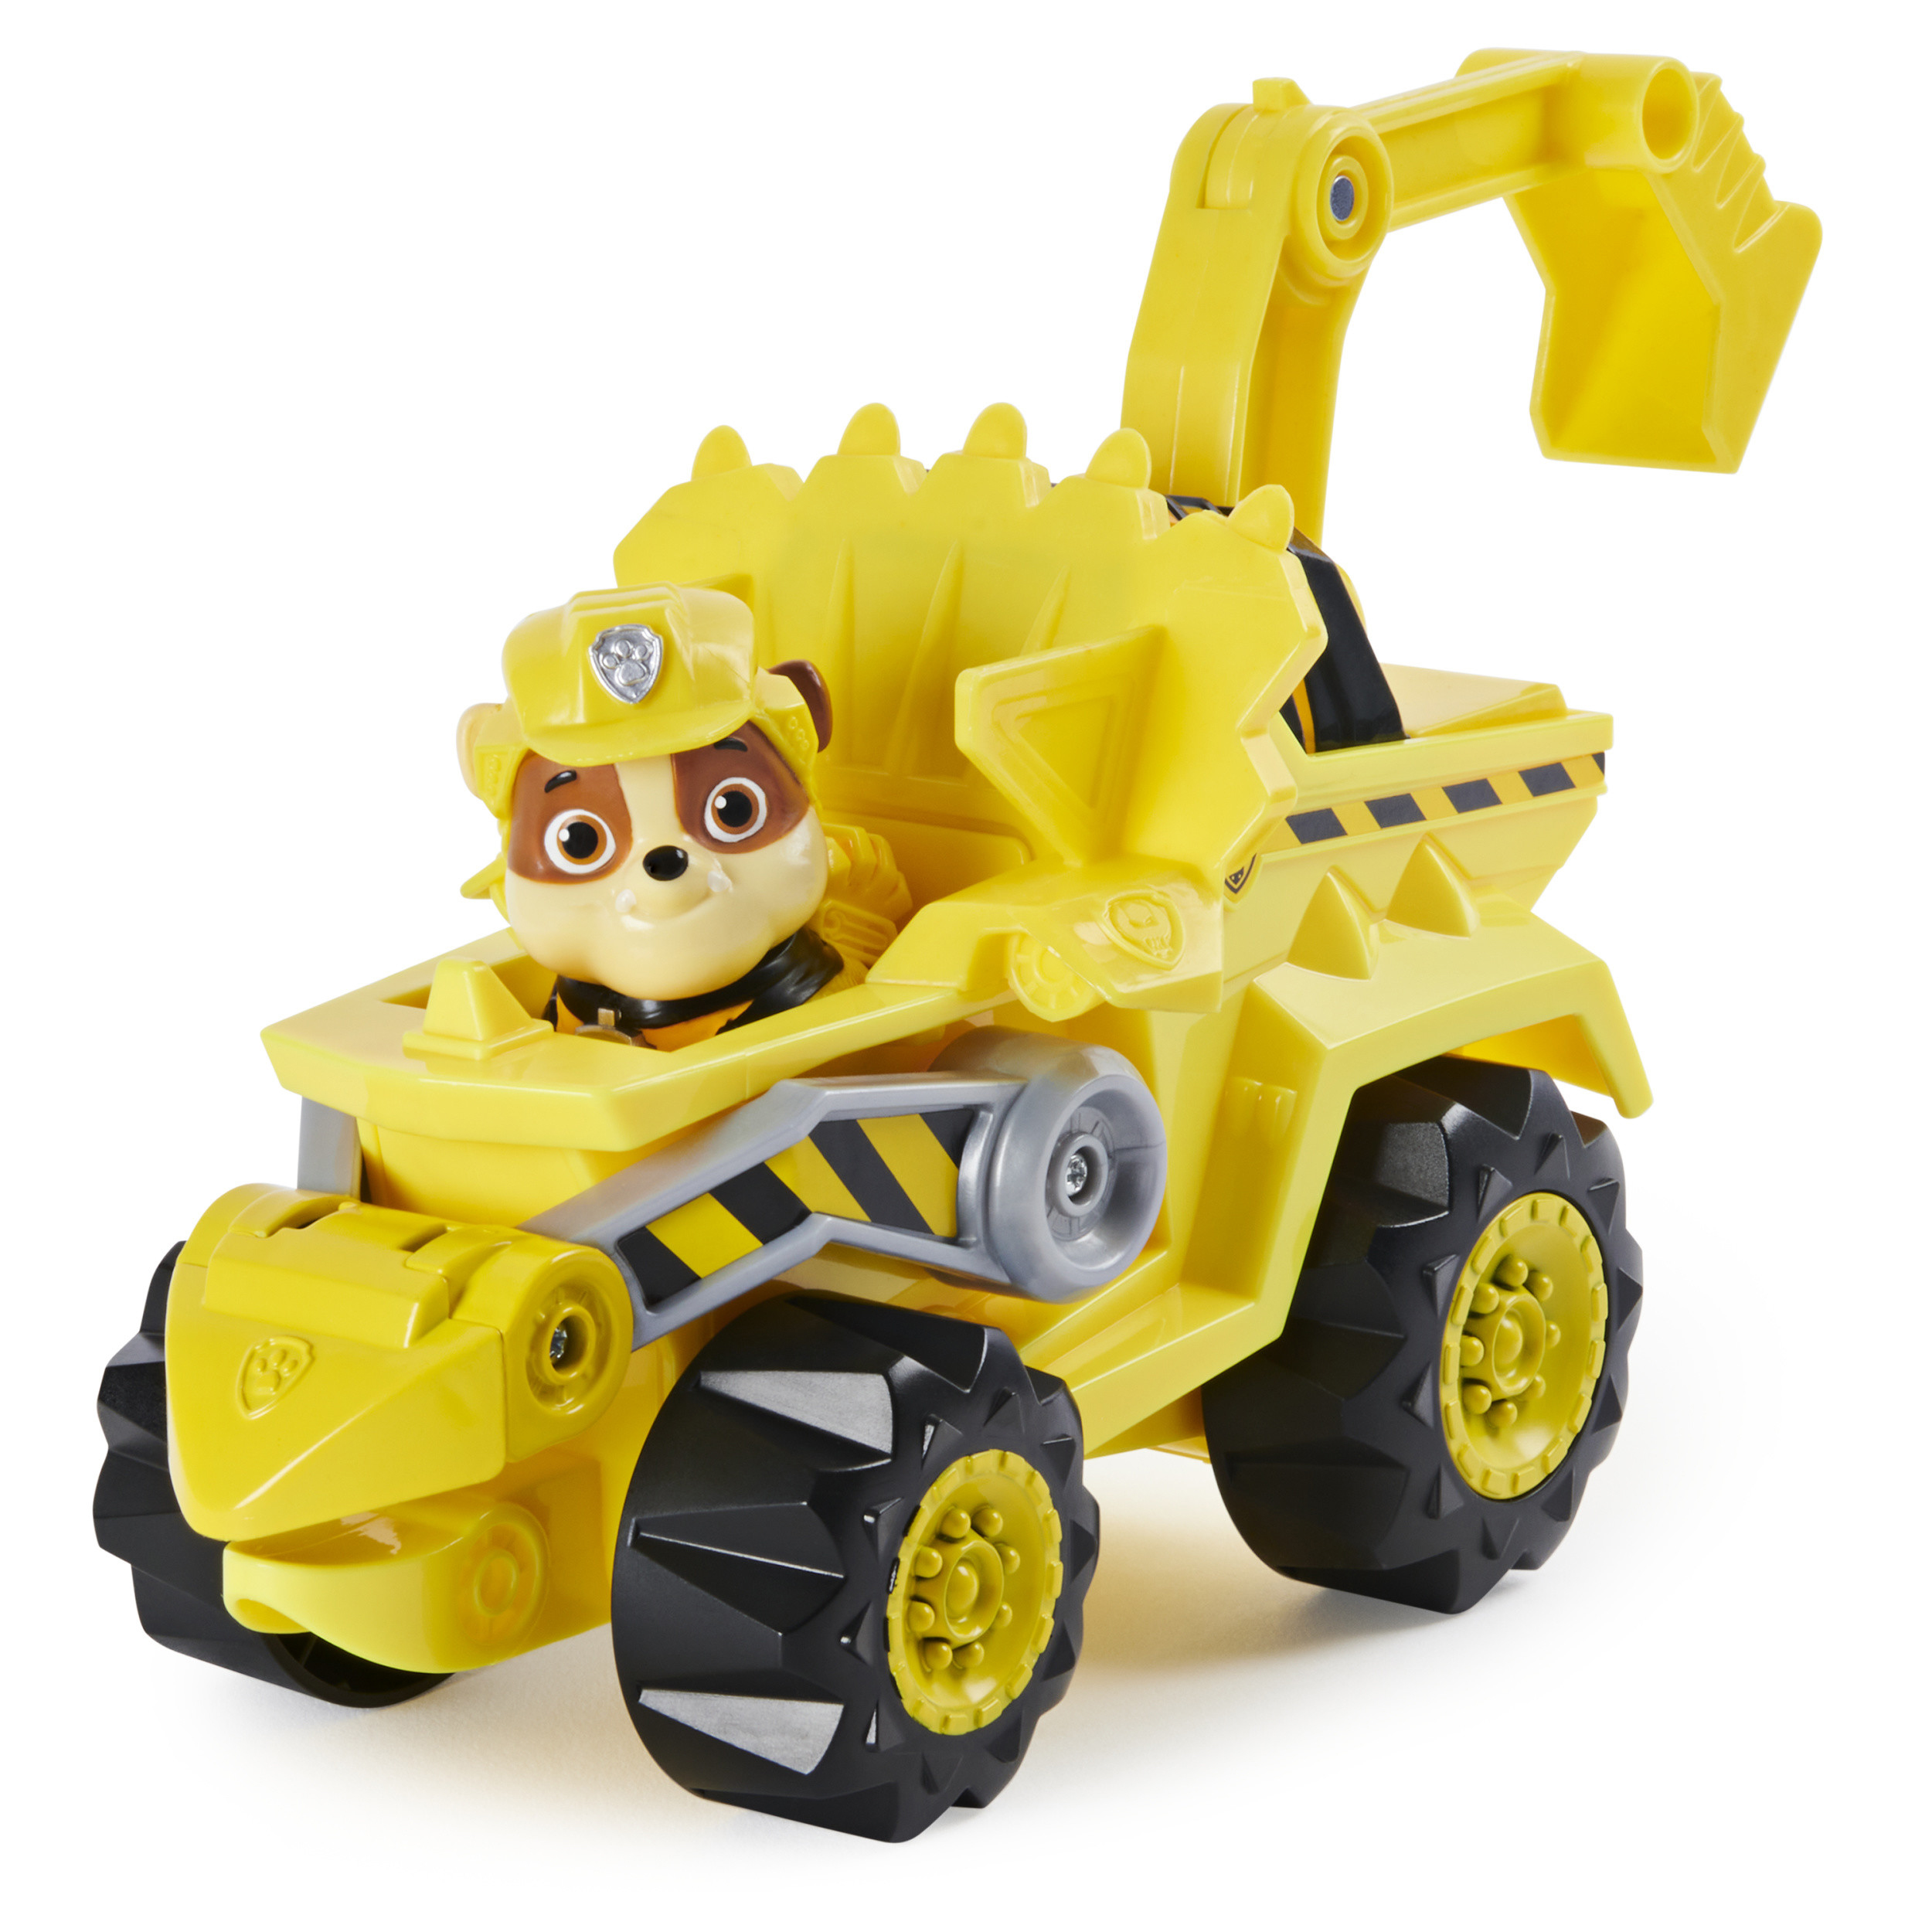 Paw Patrol Rubble Dino Rescue Køretøj